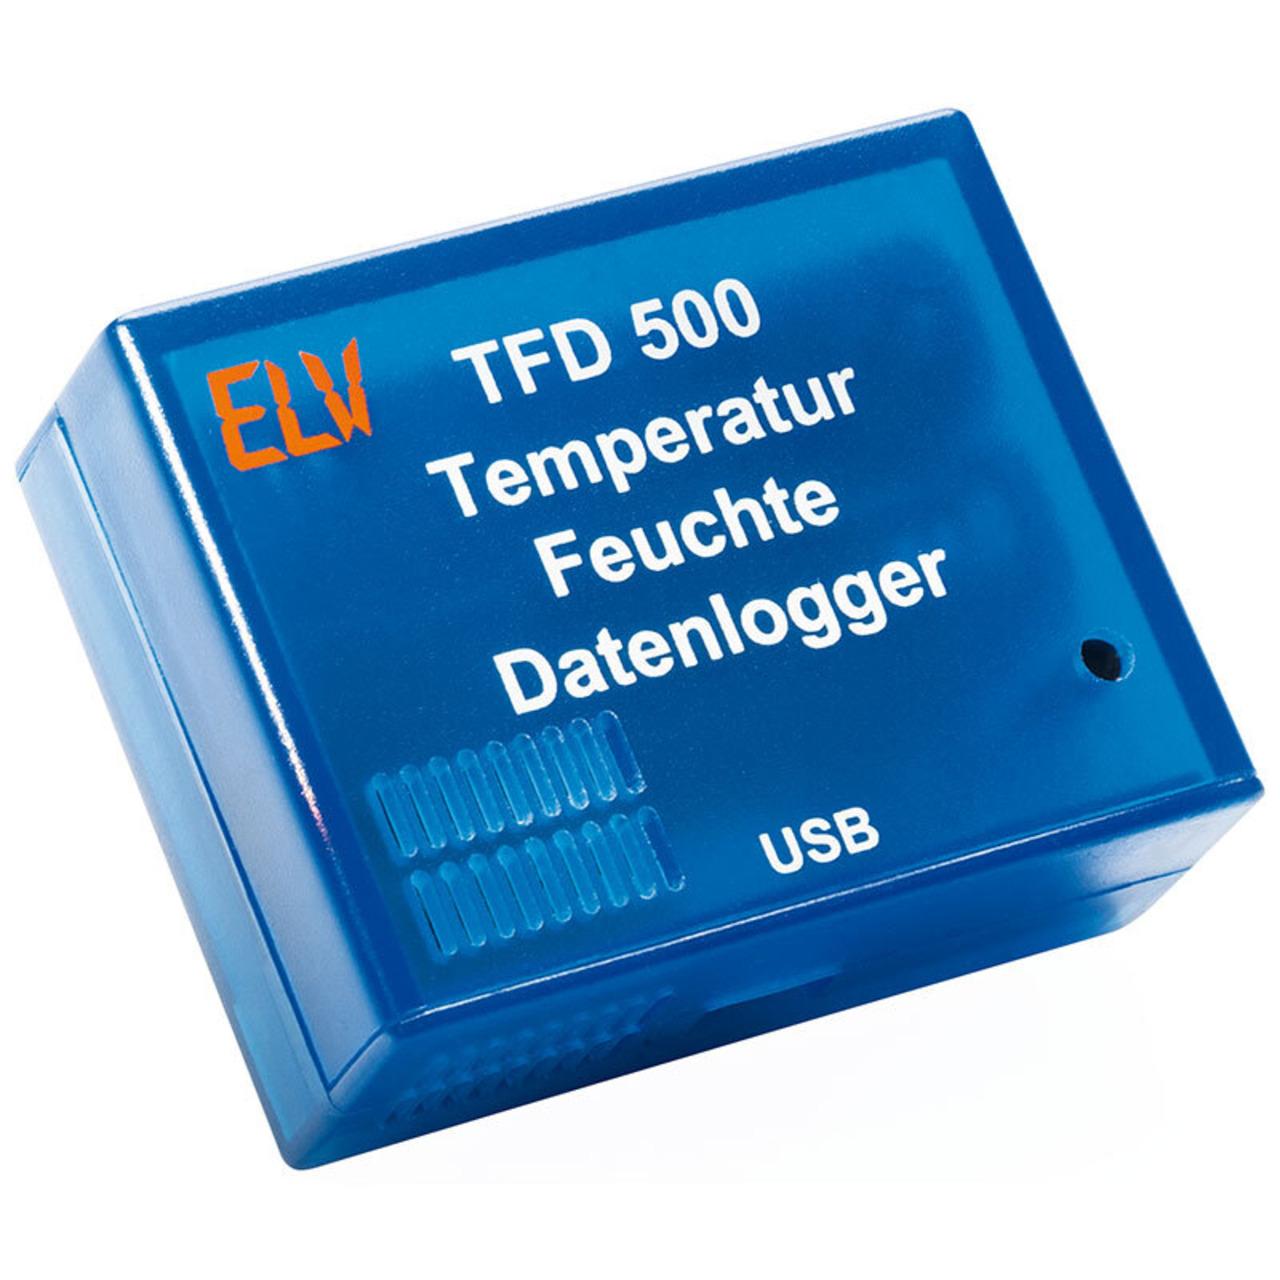 ELV Temperatur-Feuchte-Datenlogger TFD 500